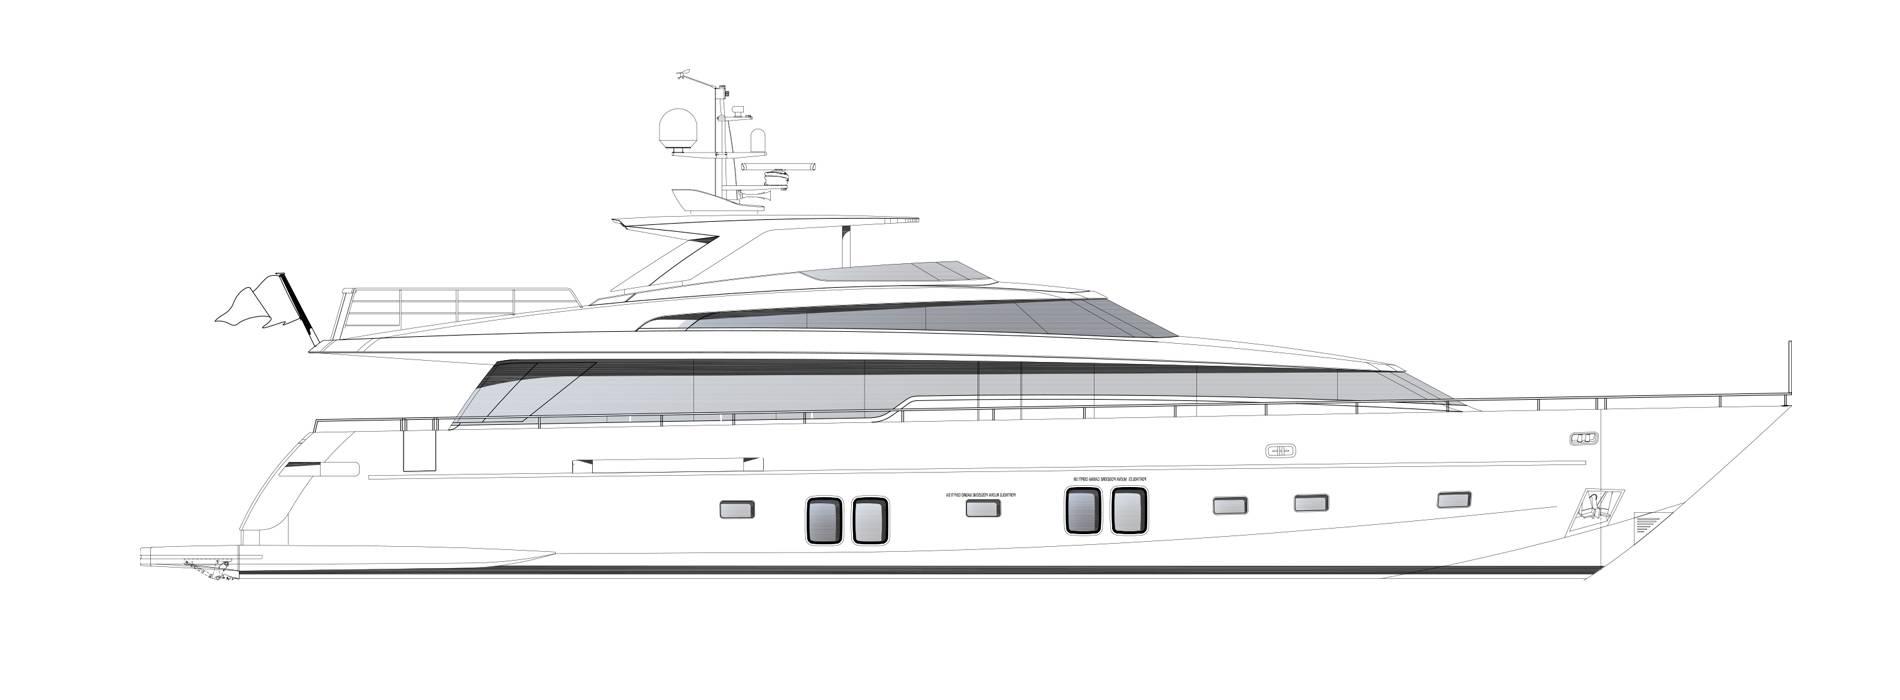 Sanlorenzo Yachts SL96-684 Perfil